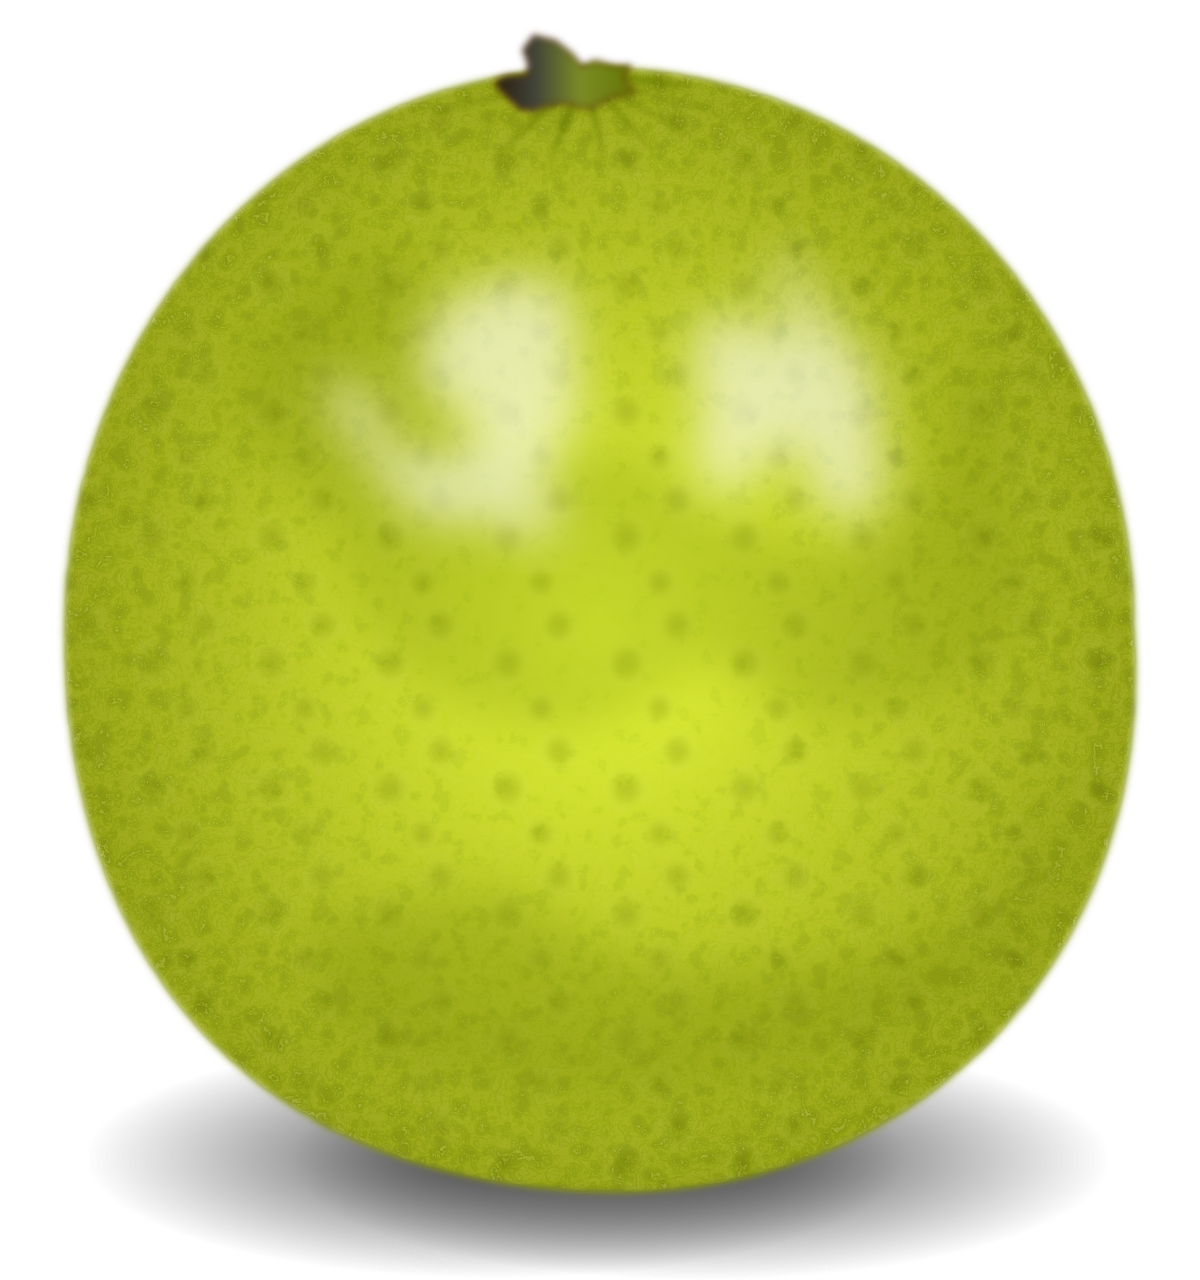 Citrusové plody proti stresu